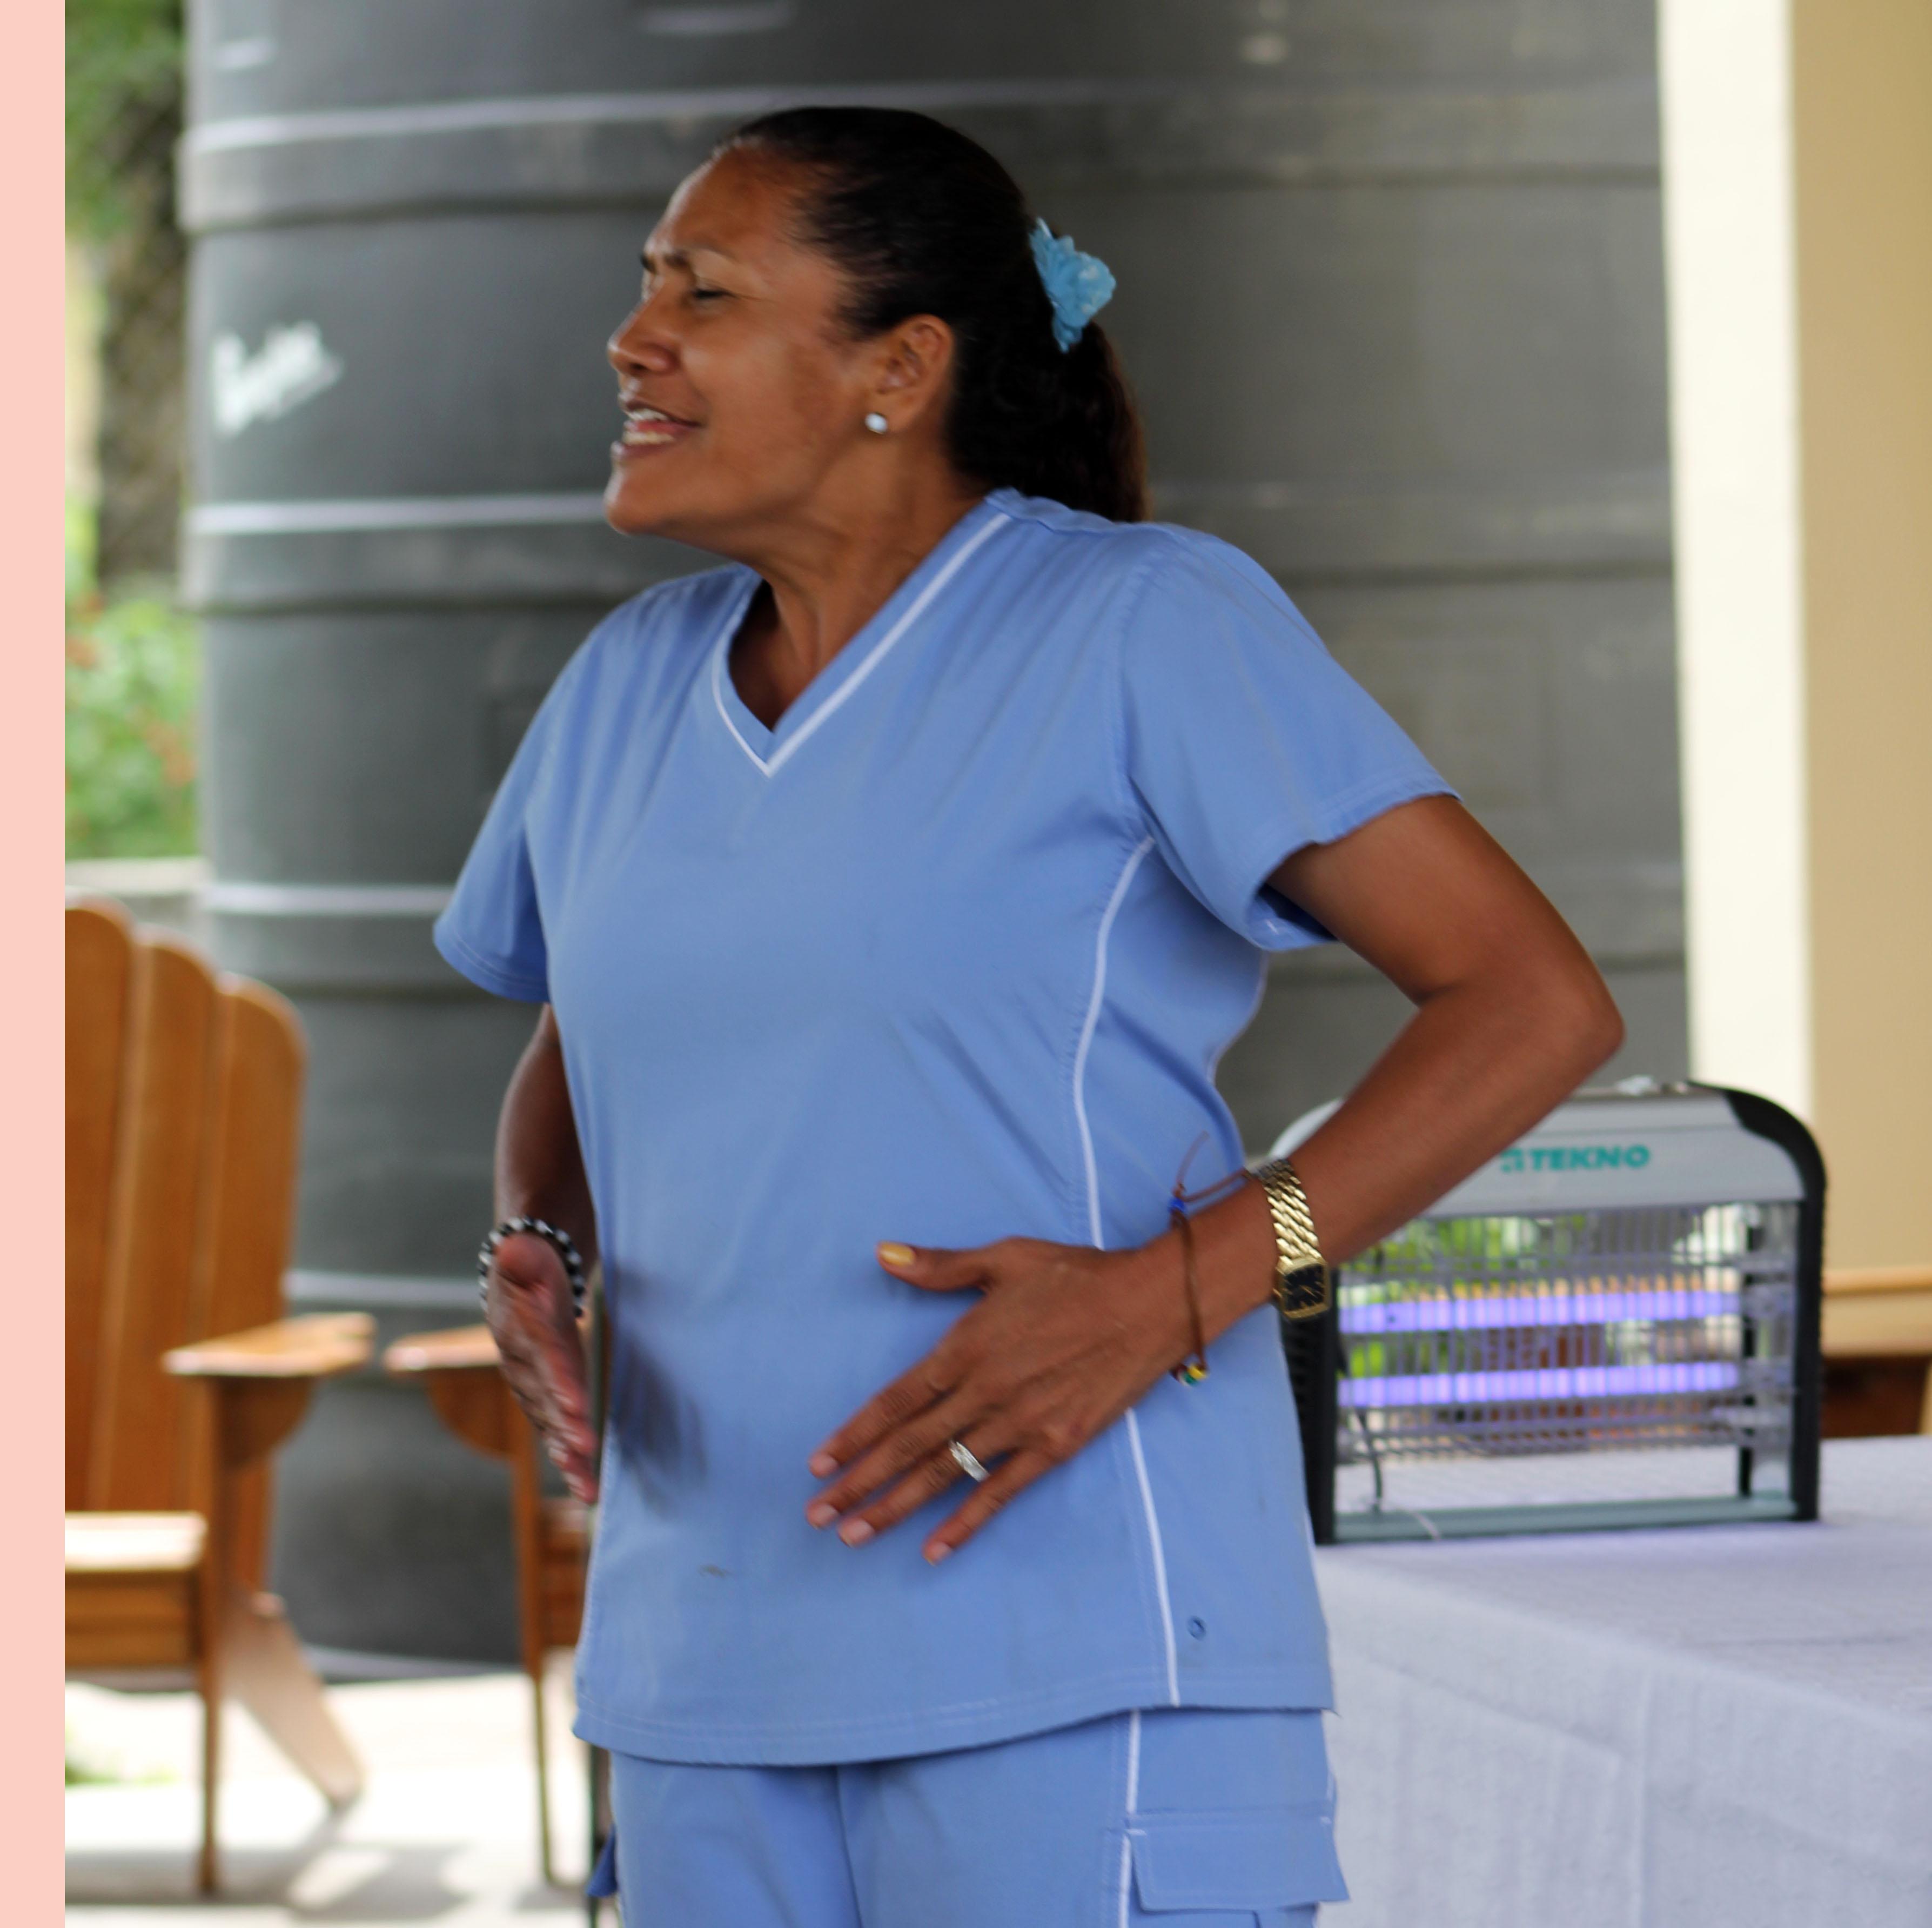 Pascuala midwife training.JPG